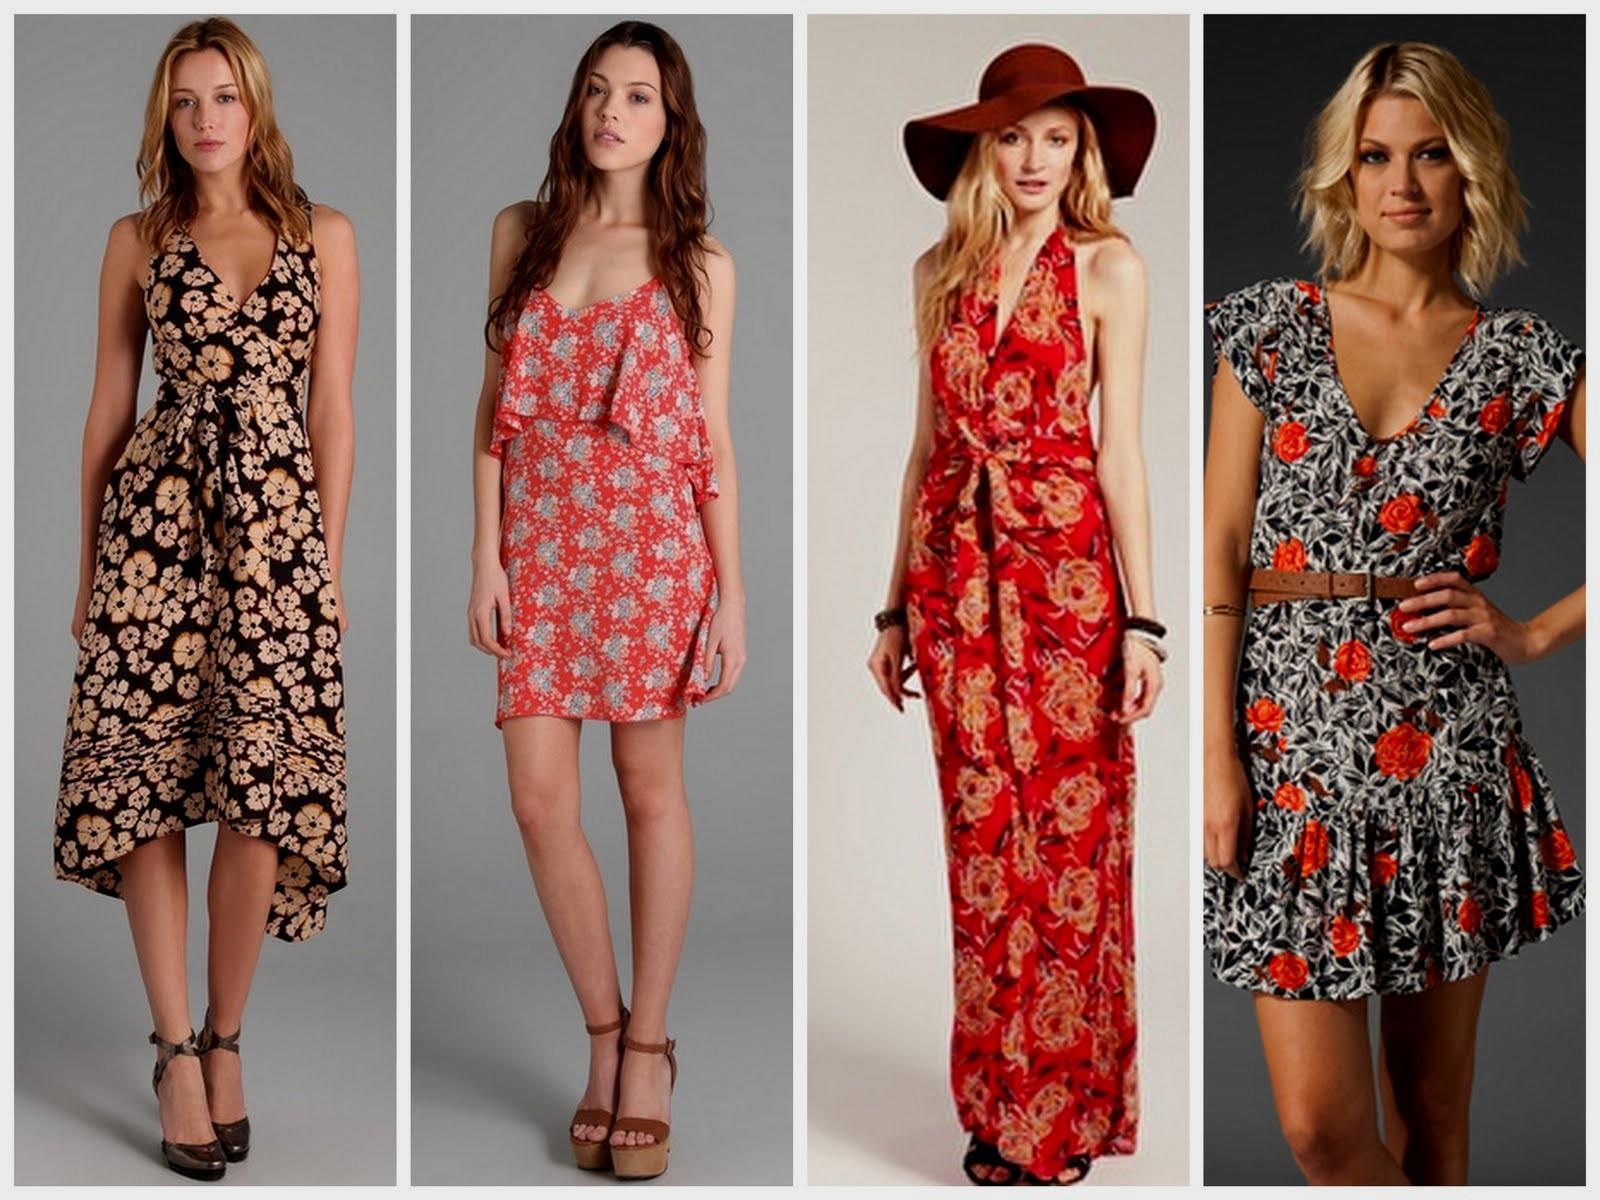 Dlugie modne sukienki (6)